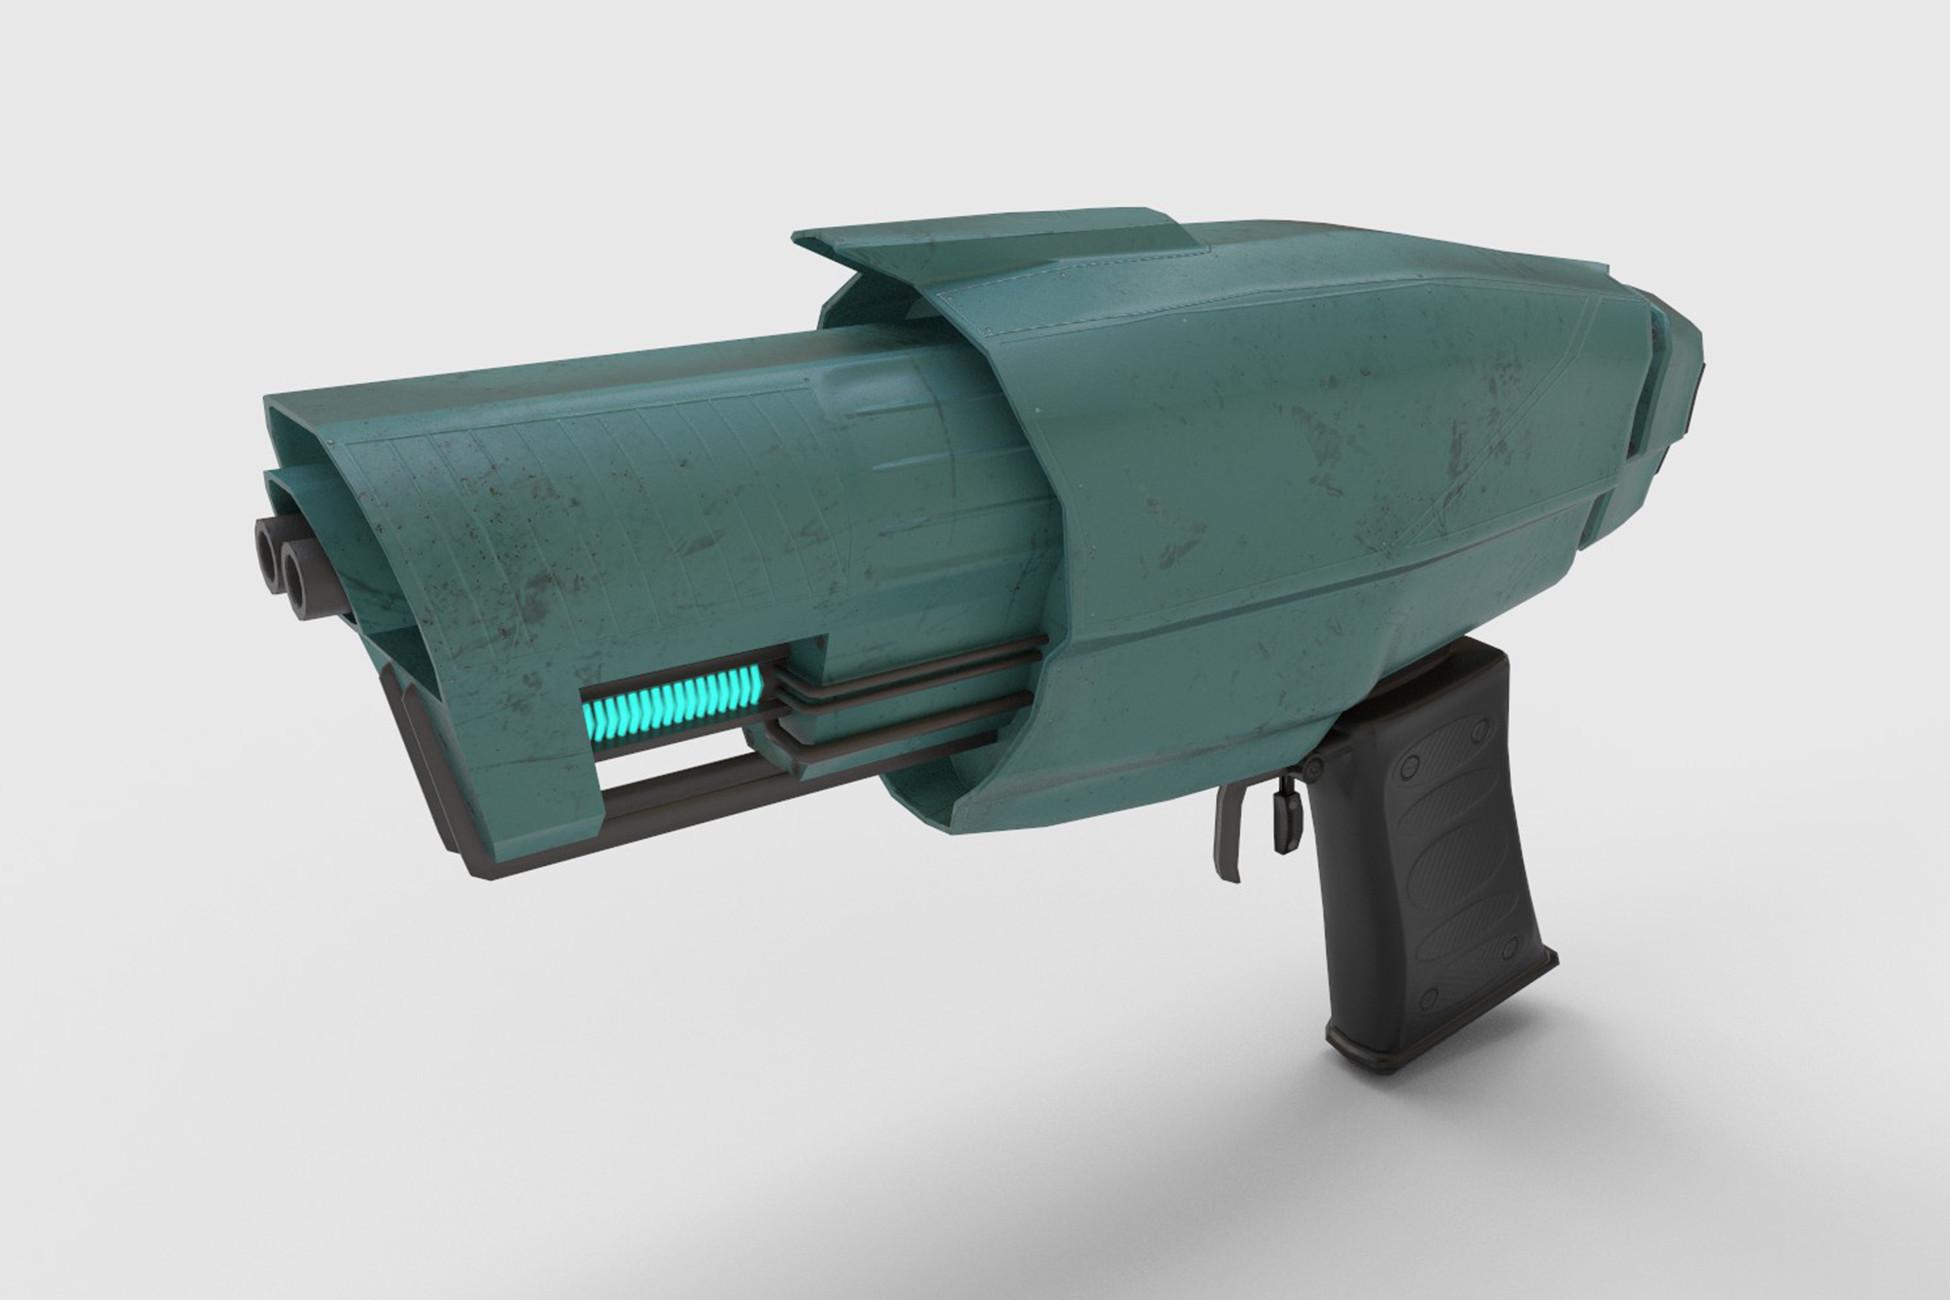 Sci-Fi Pistol #1